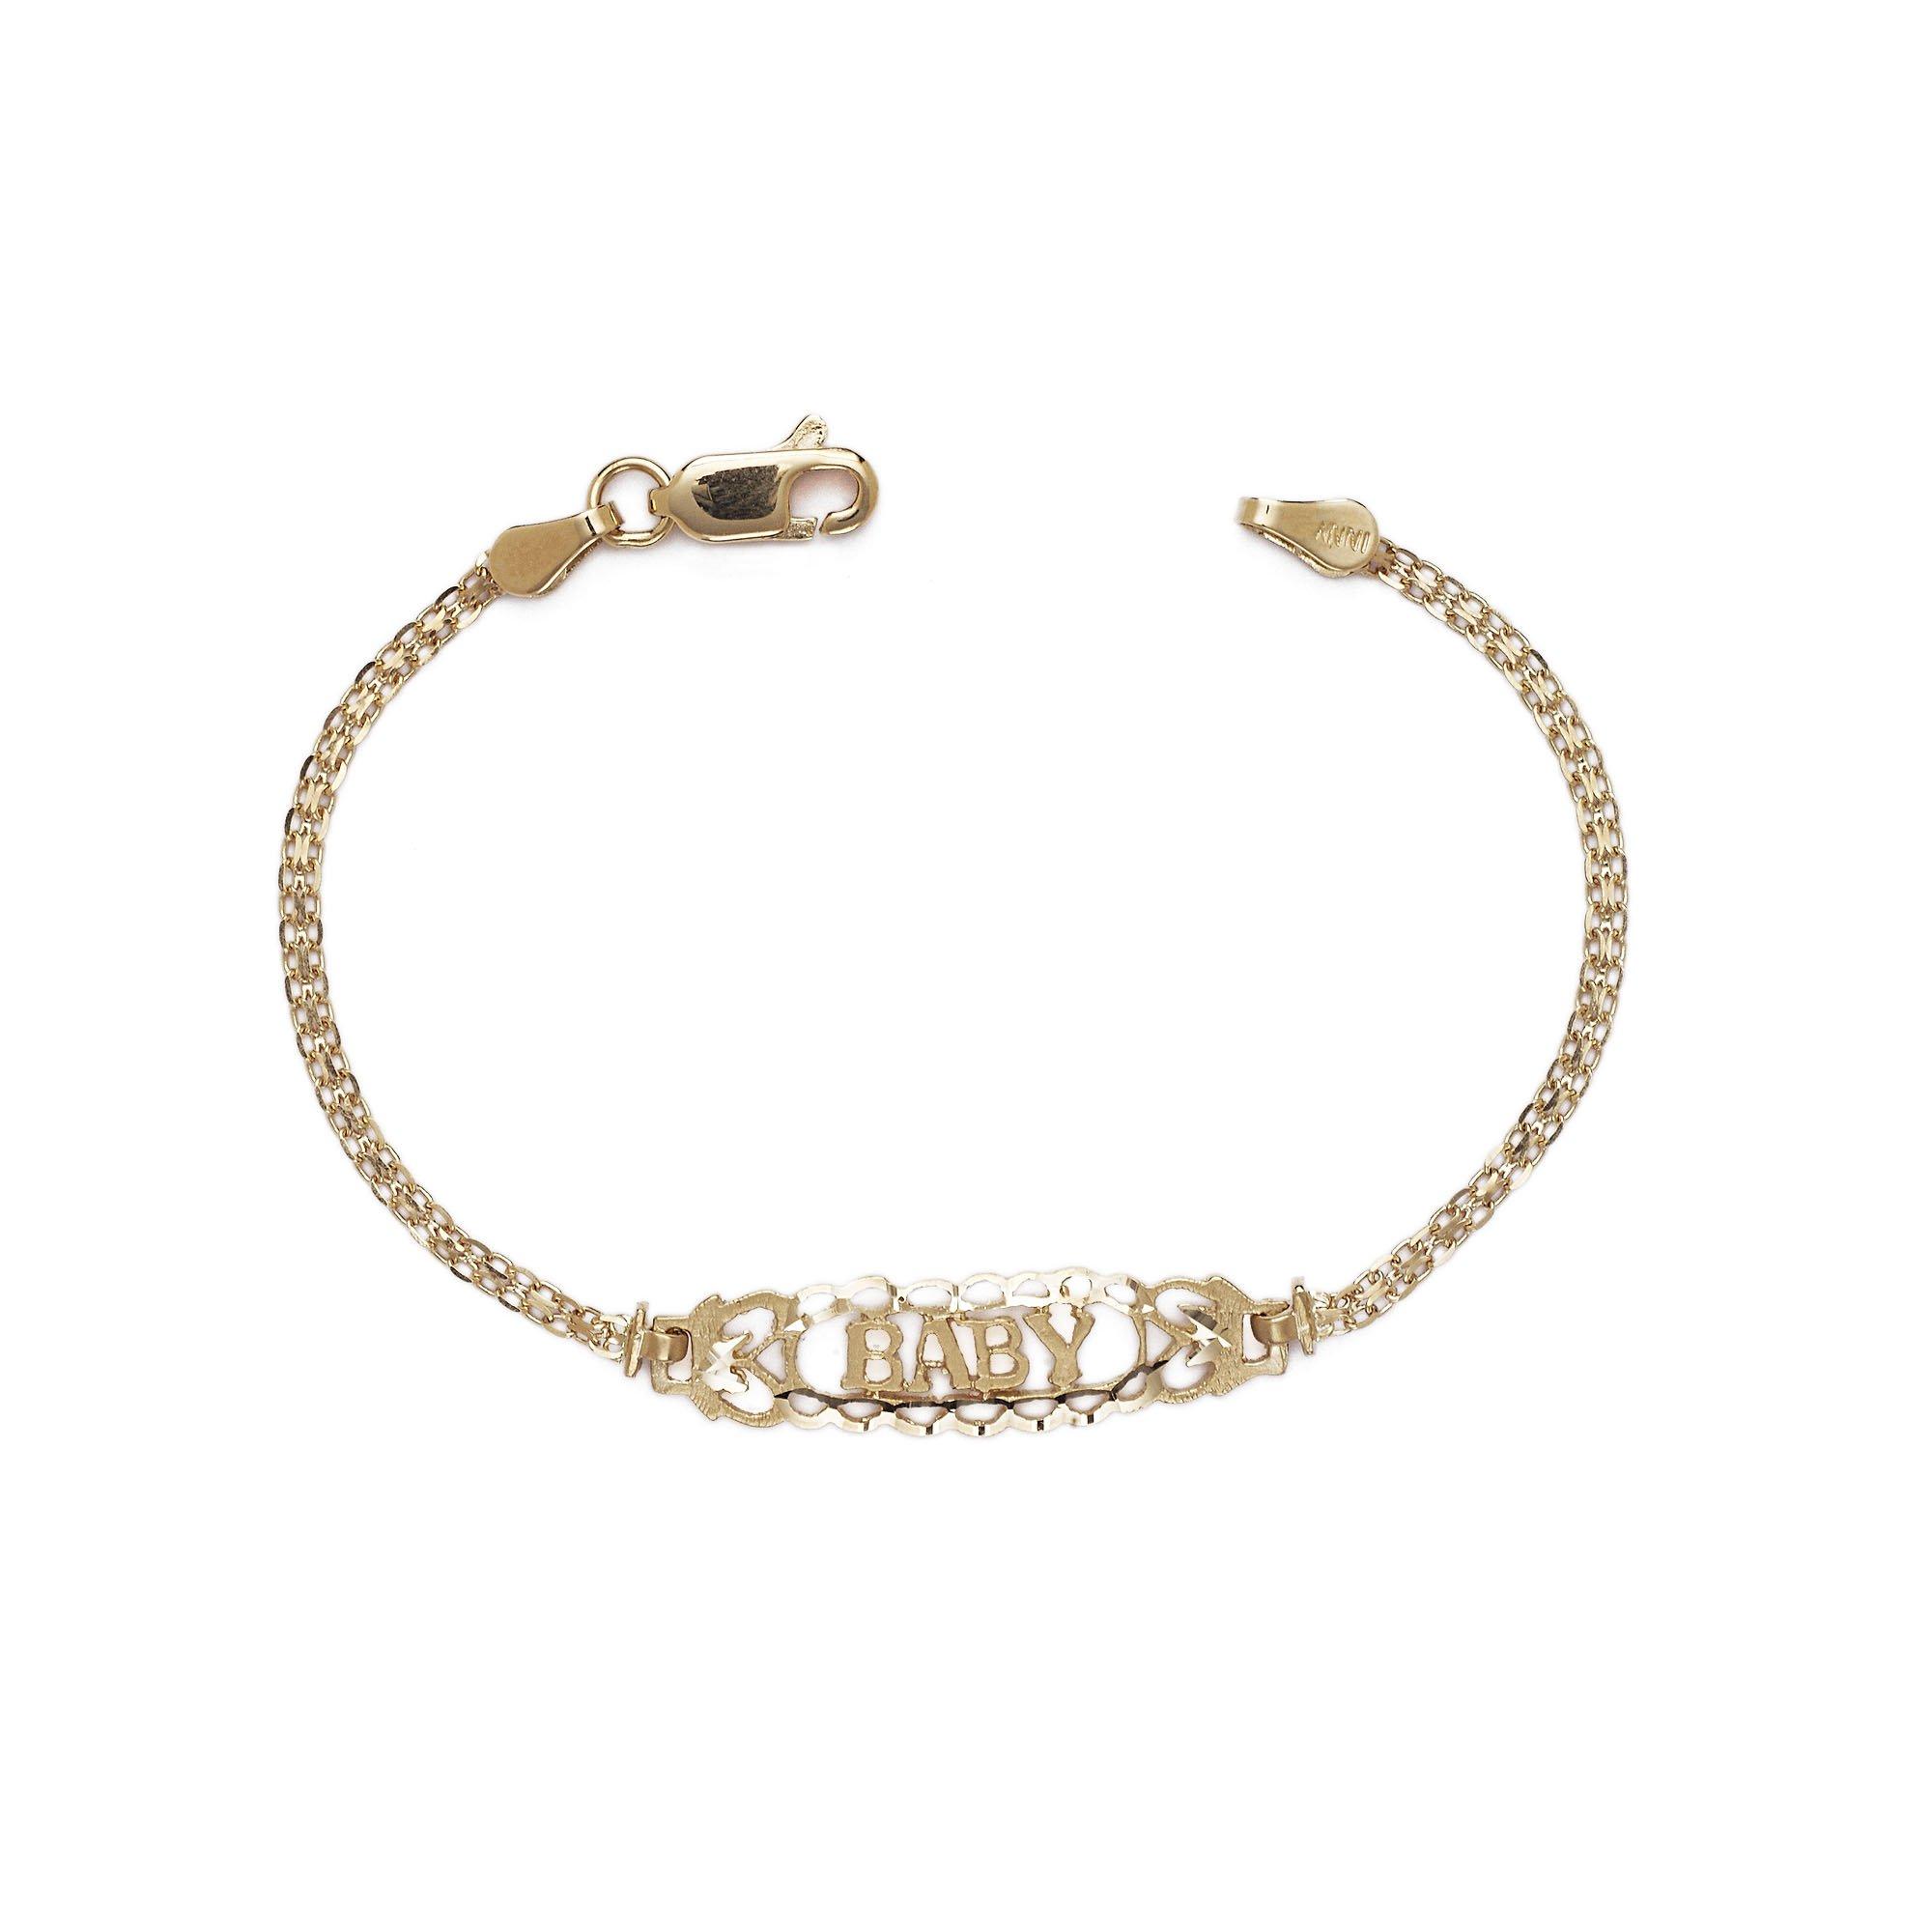 Kids Filigree Bracelet - 10k Yellow Gold - 5.5 Inch